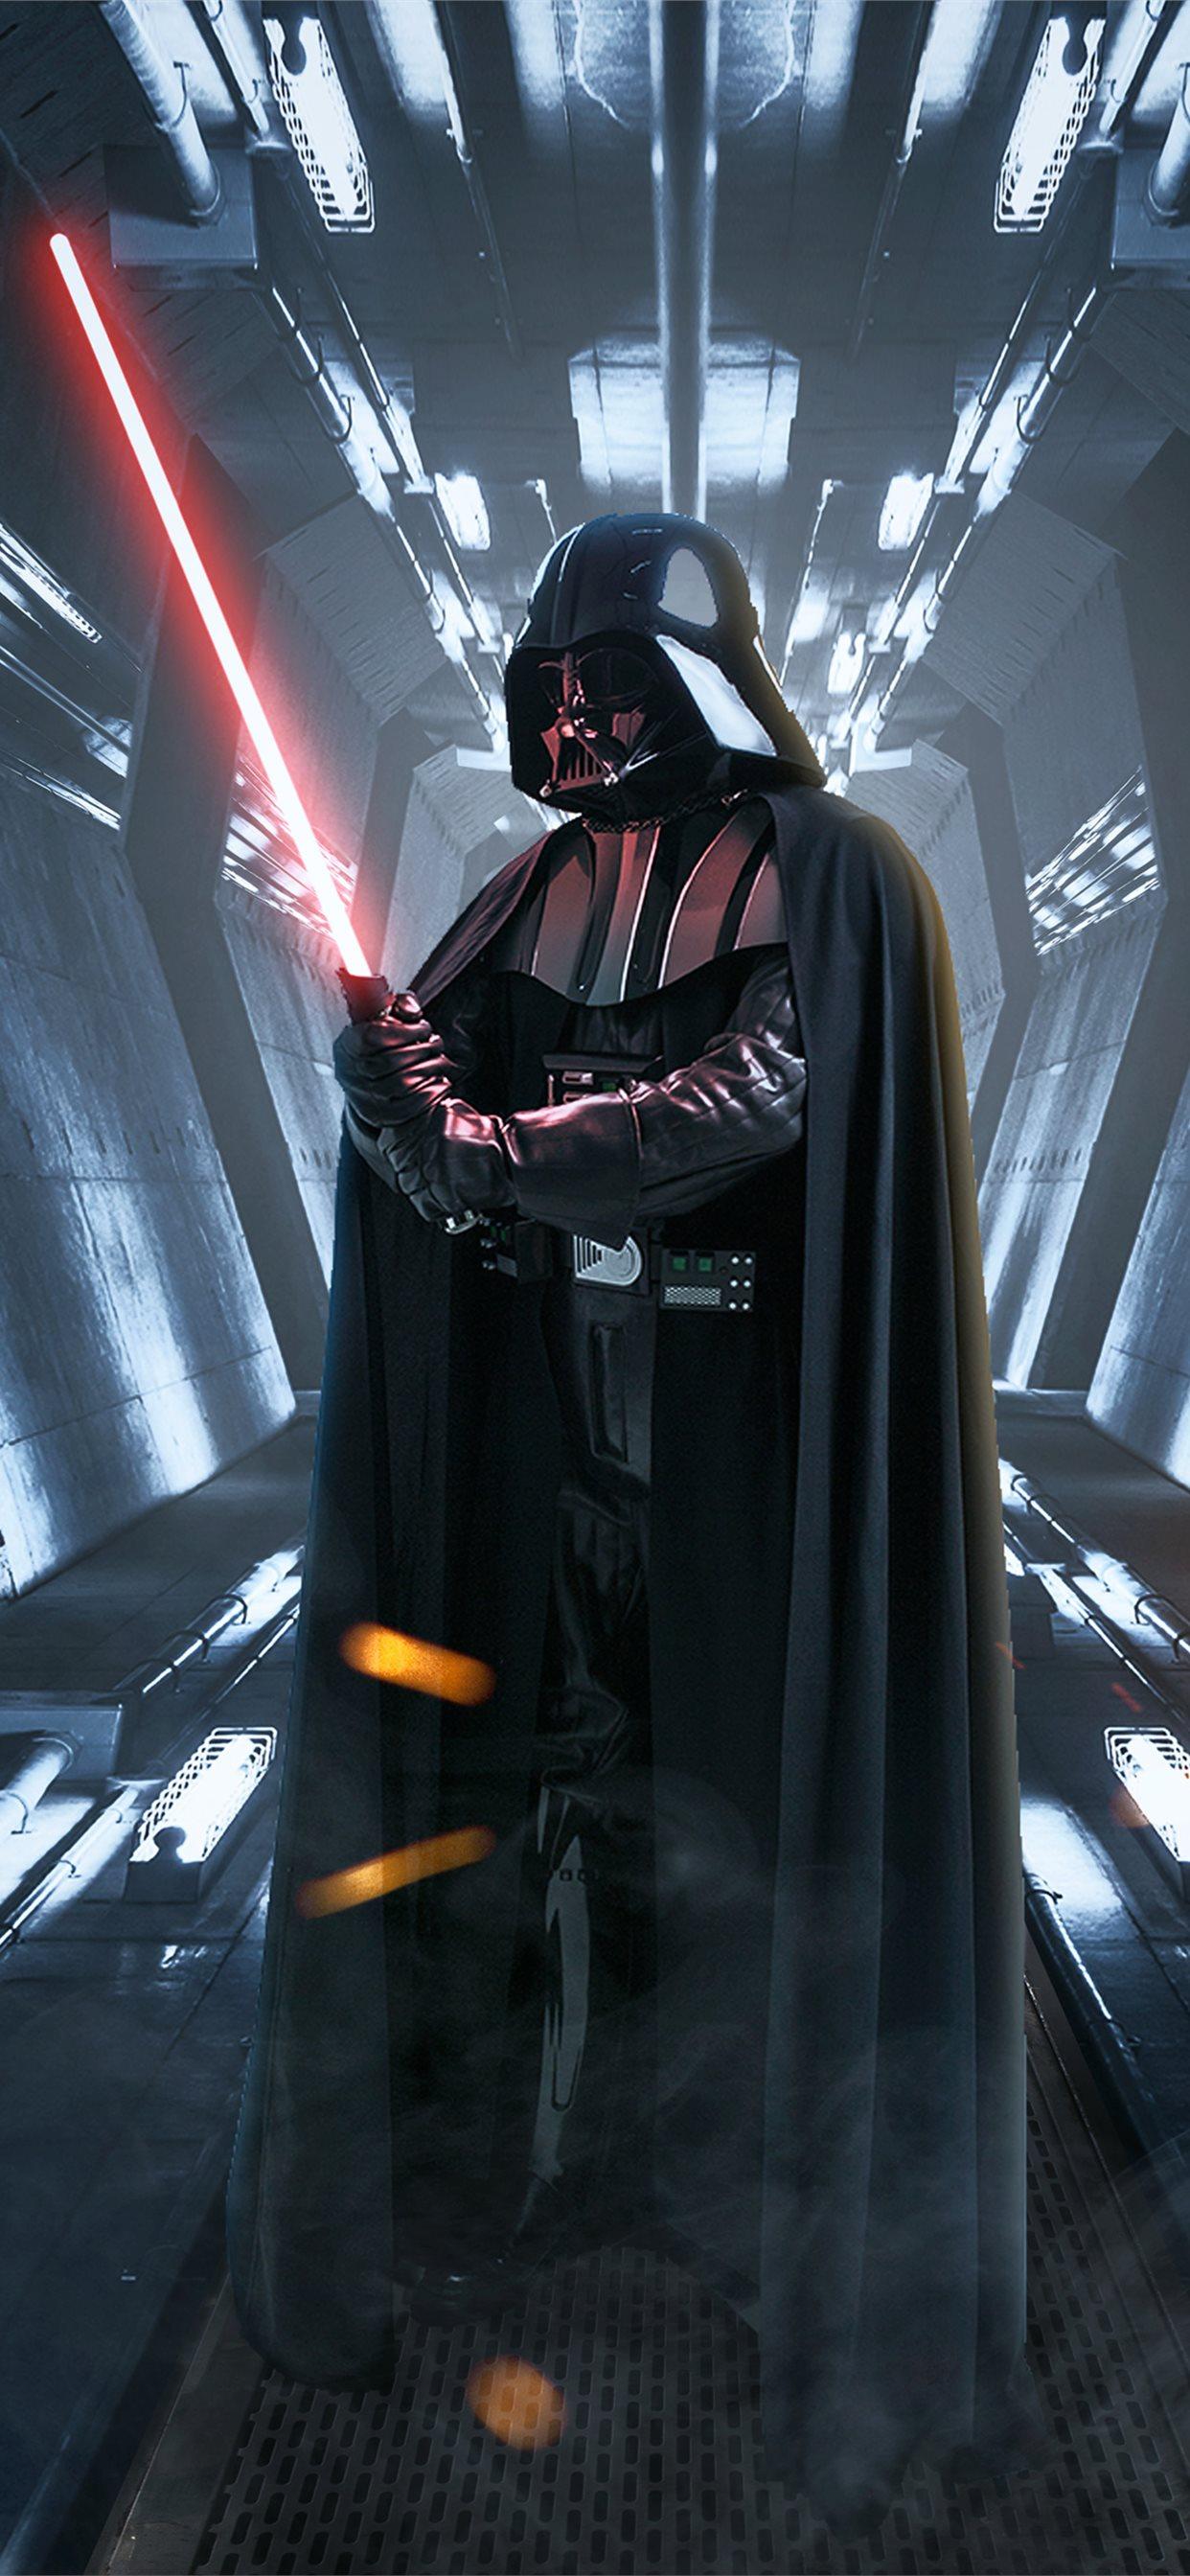 2020 Darth Vader 4k Iphone X Wallpapers Free Download